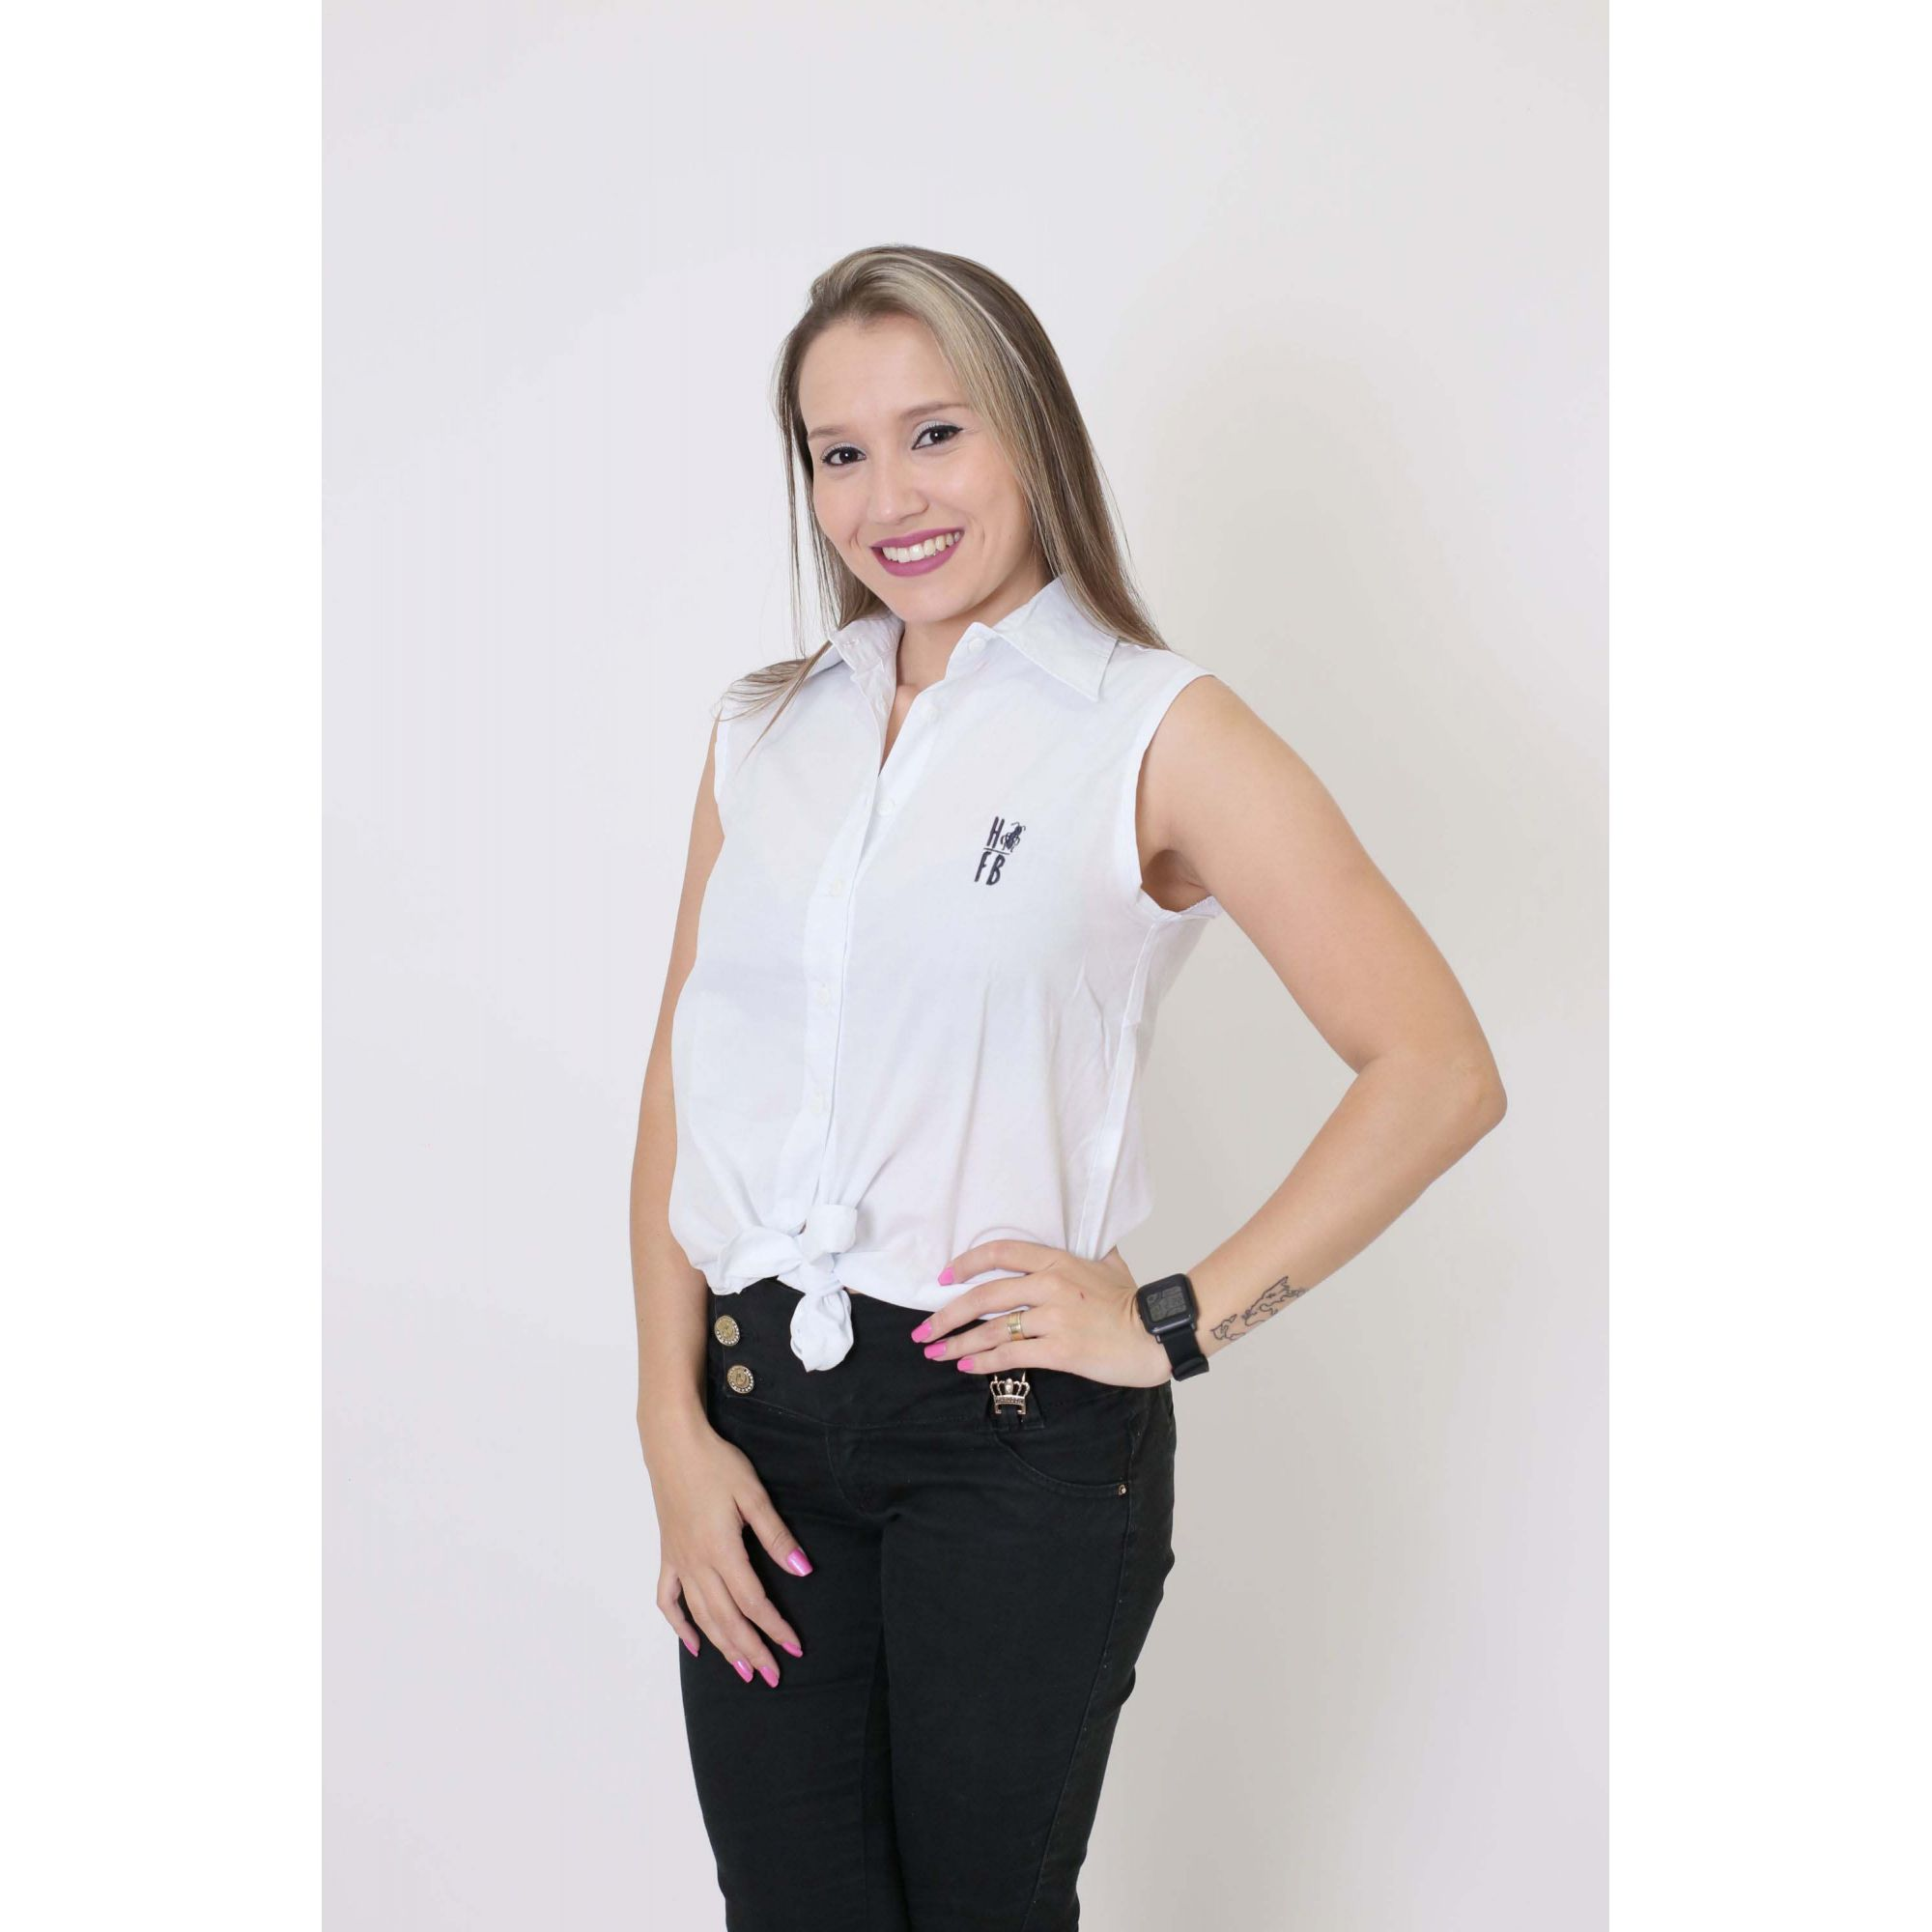 MÃE E FILHO > Camisa Feminina + Bermuda Infantil Branca [Coleção Tal Mãe Tal Filho]  - Heitor Fashion Brazil